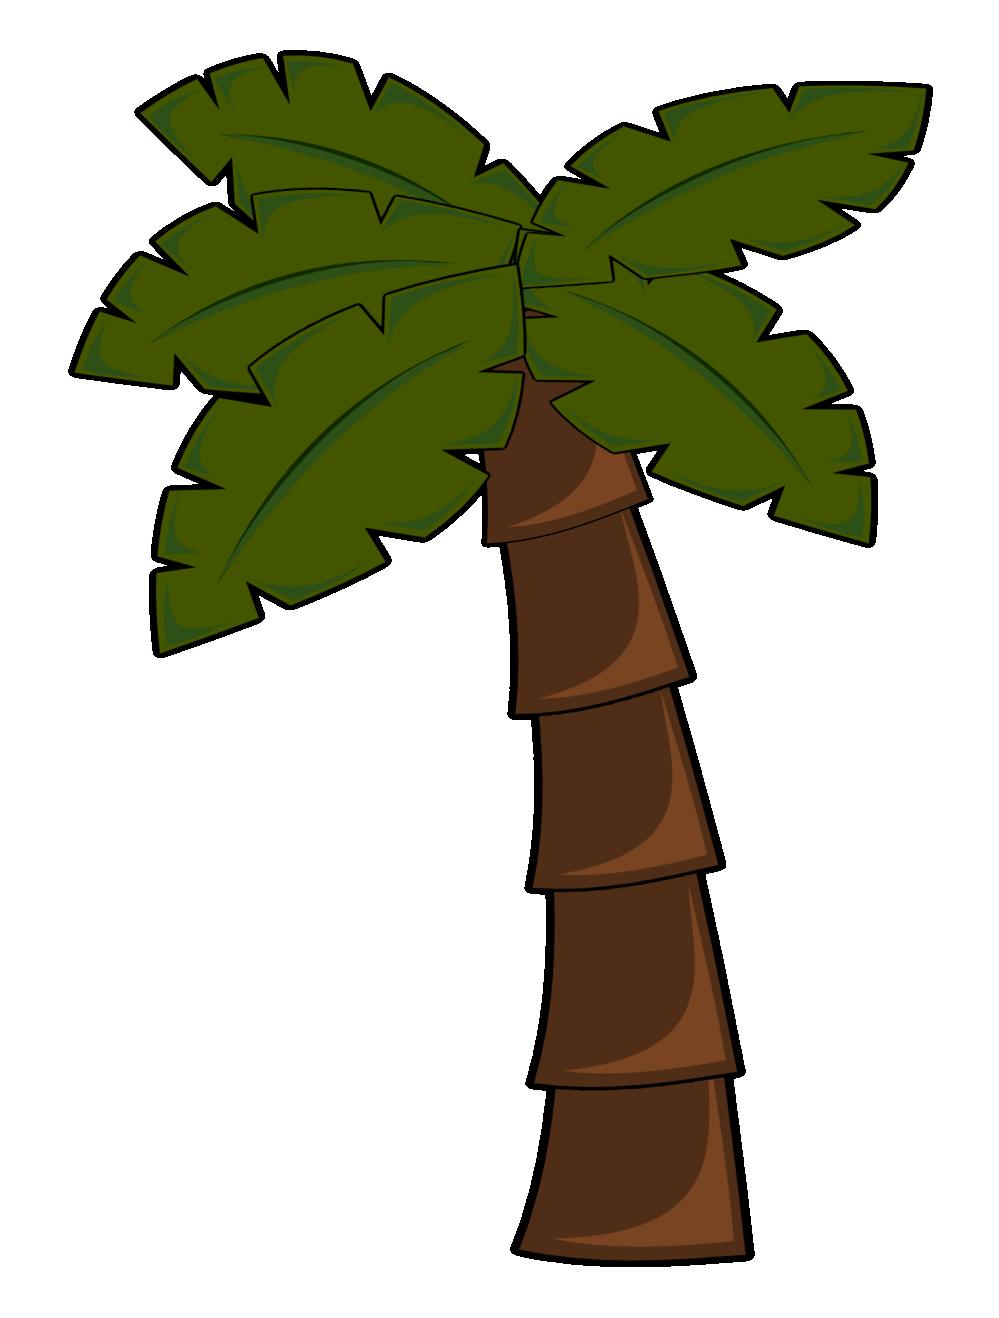 Luau Palm Tree Clip Art | Clipart Panda - Free Clipart Images ...